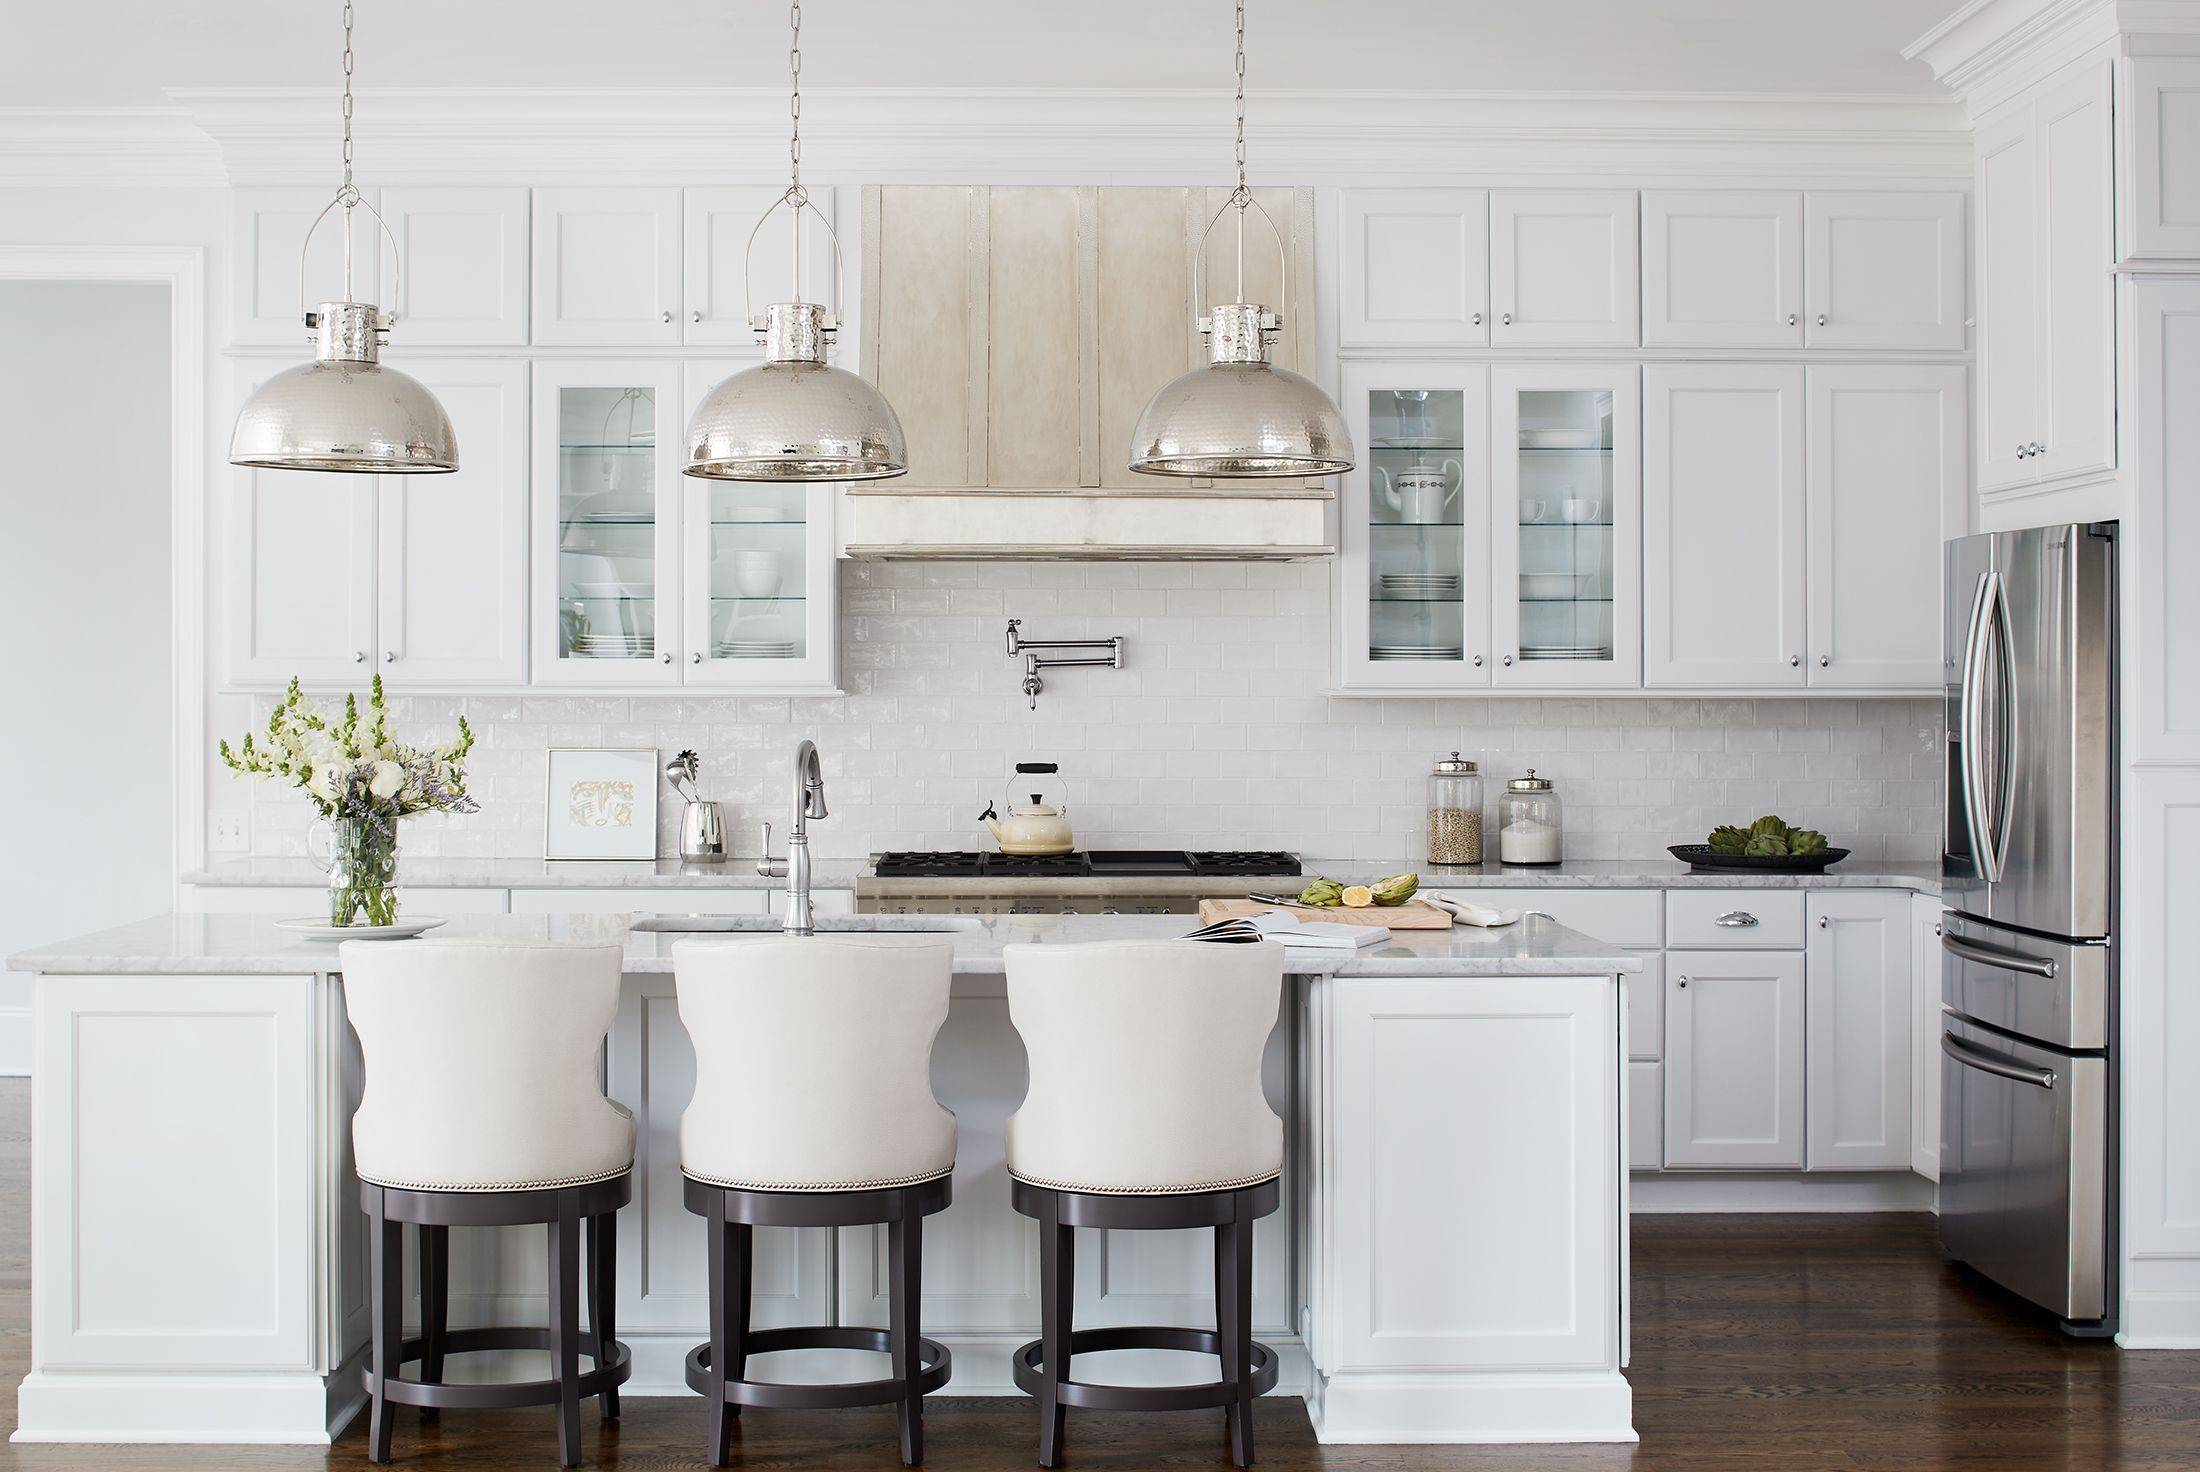 white kitchen kitchen cabinets white kitchen with steel favorable whom white kitchen ideas